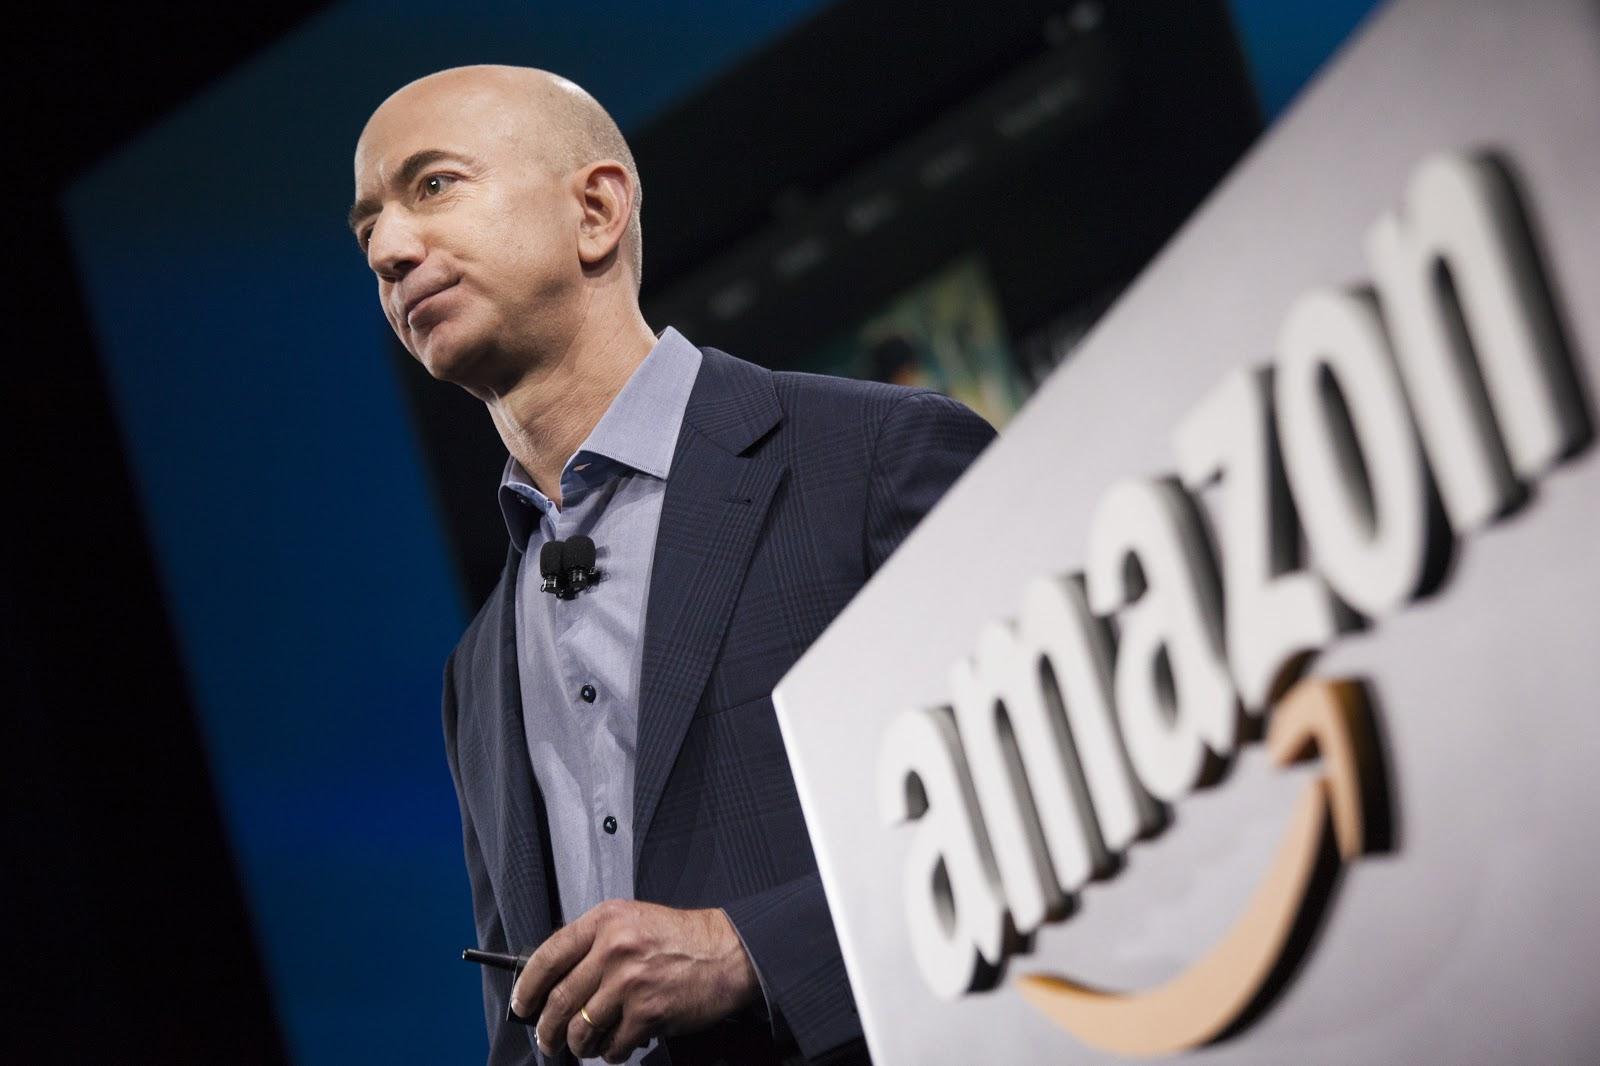 The Skills that Made Amazon CEO Jeff Bezos Successful | Fortune